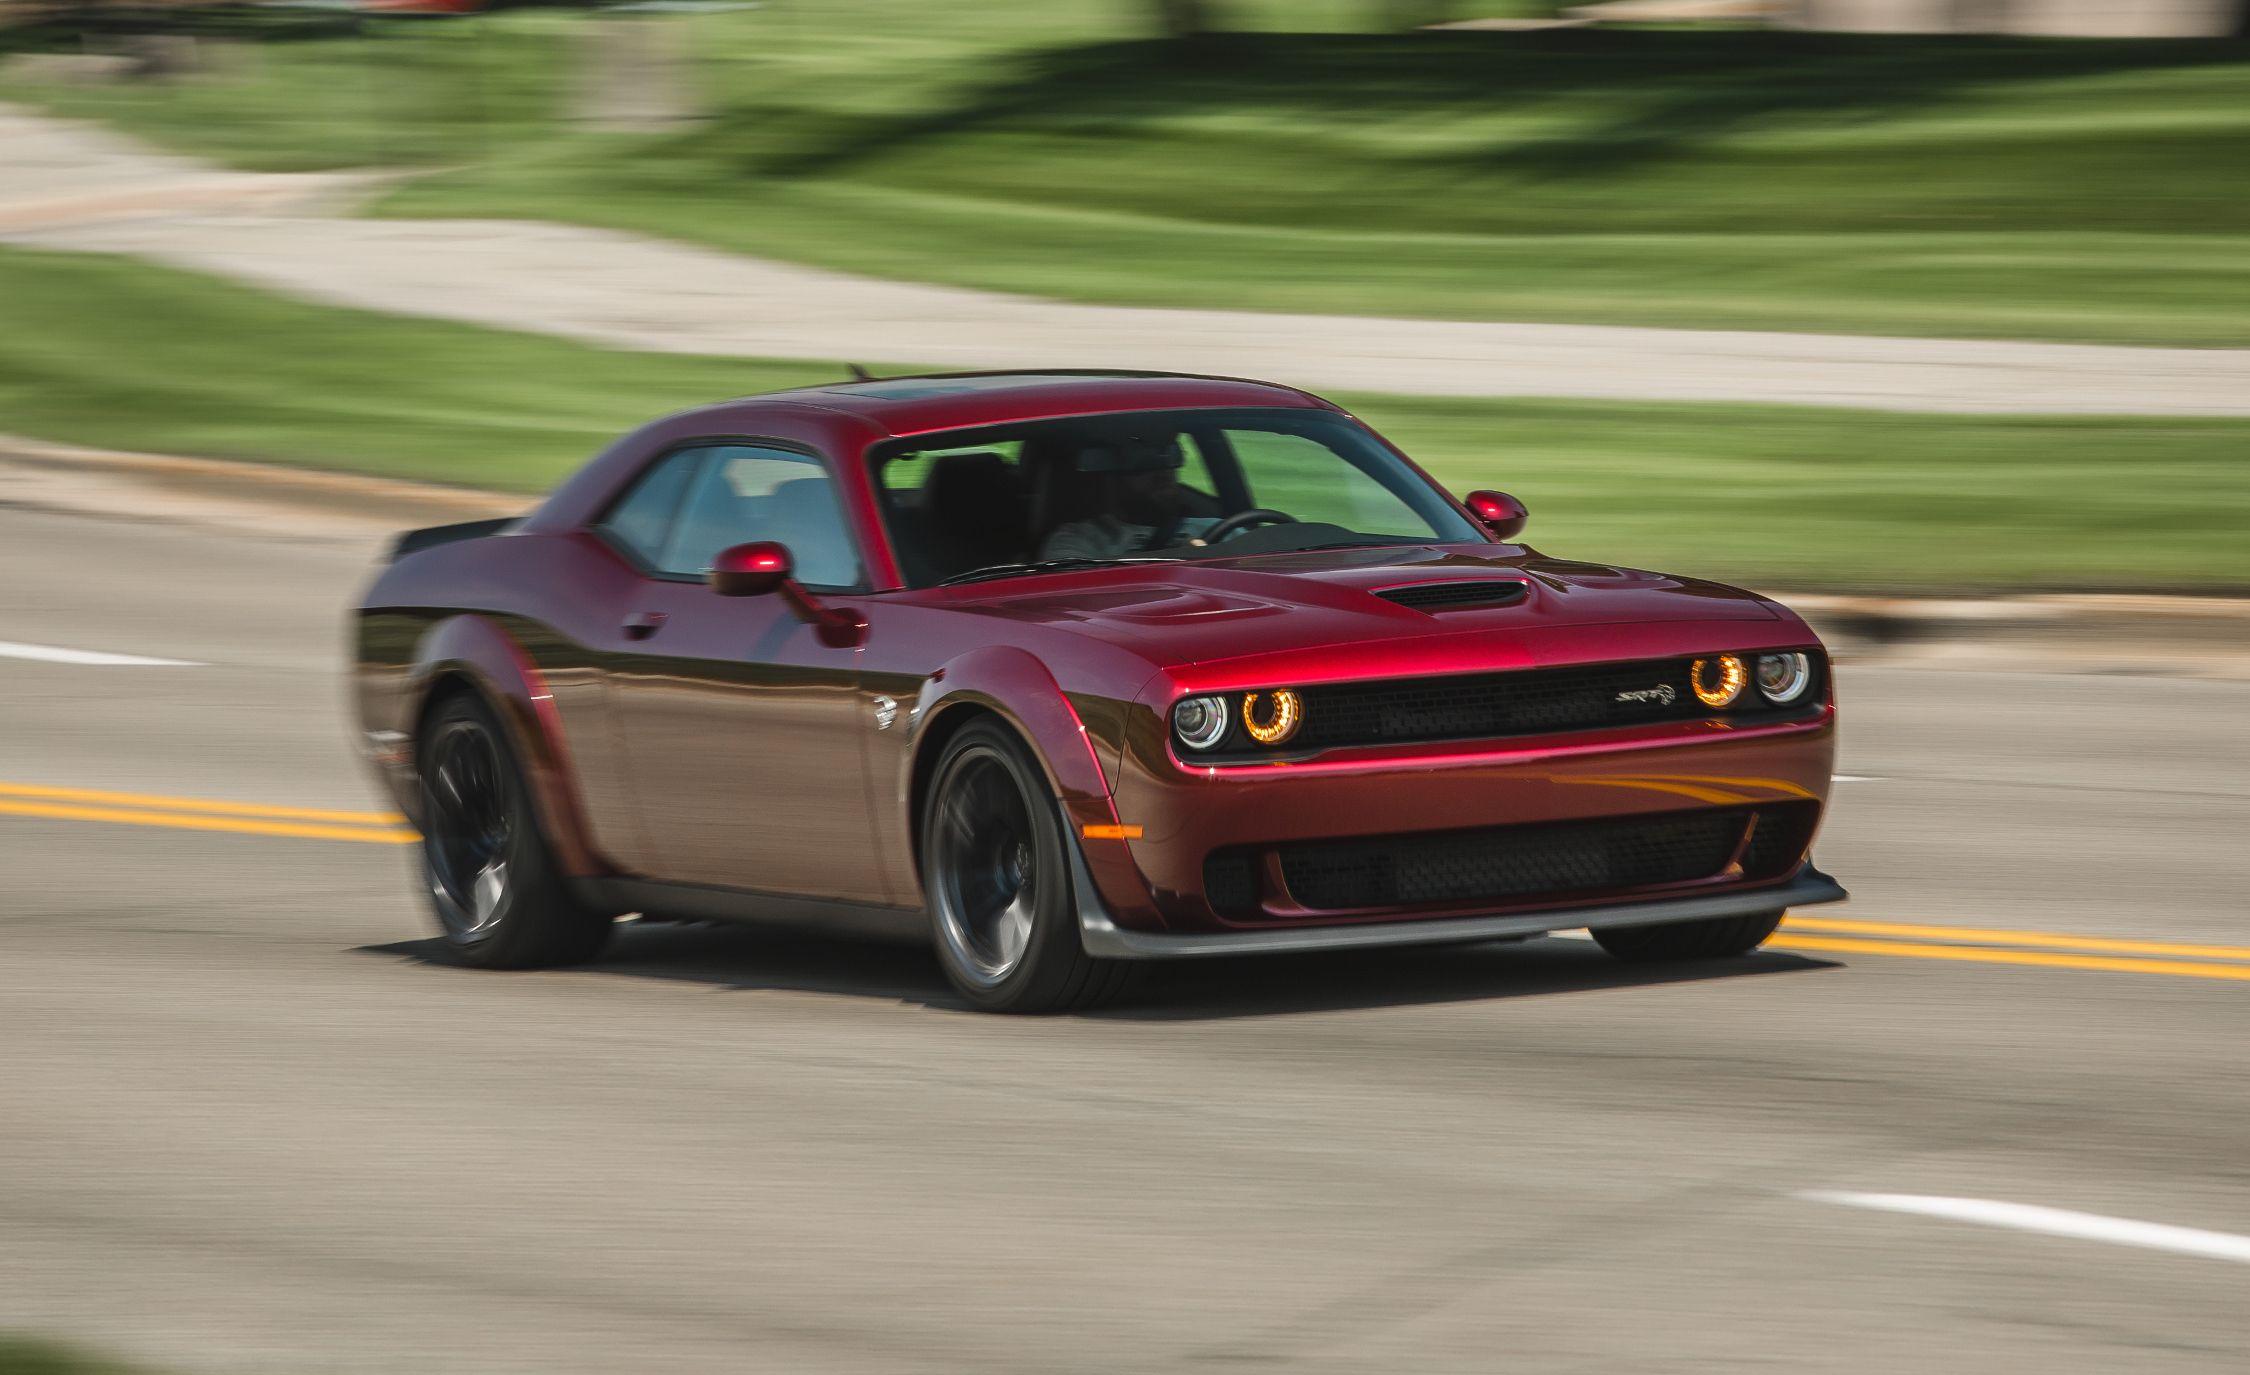 2018 Dodge Challenger SRT Hellcat Widebody Manual